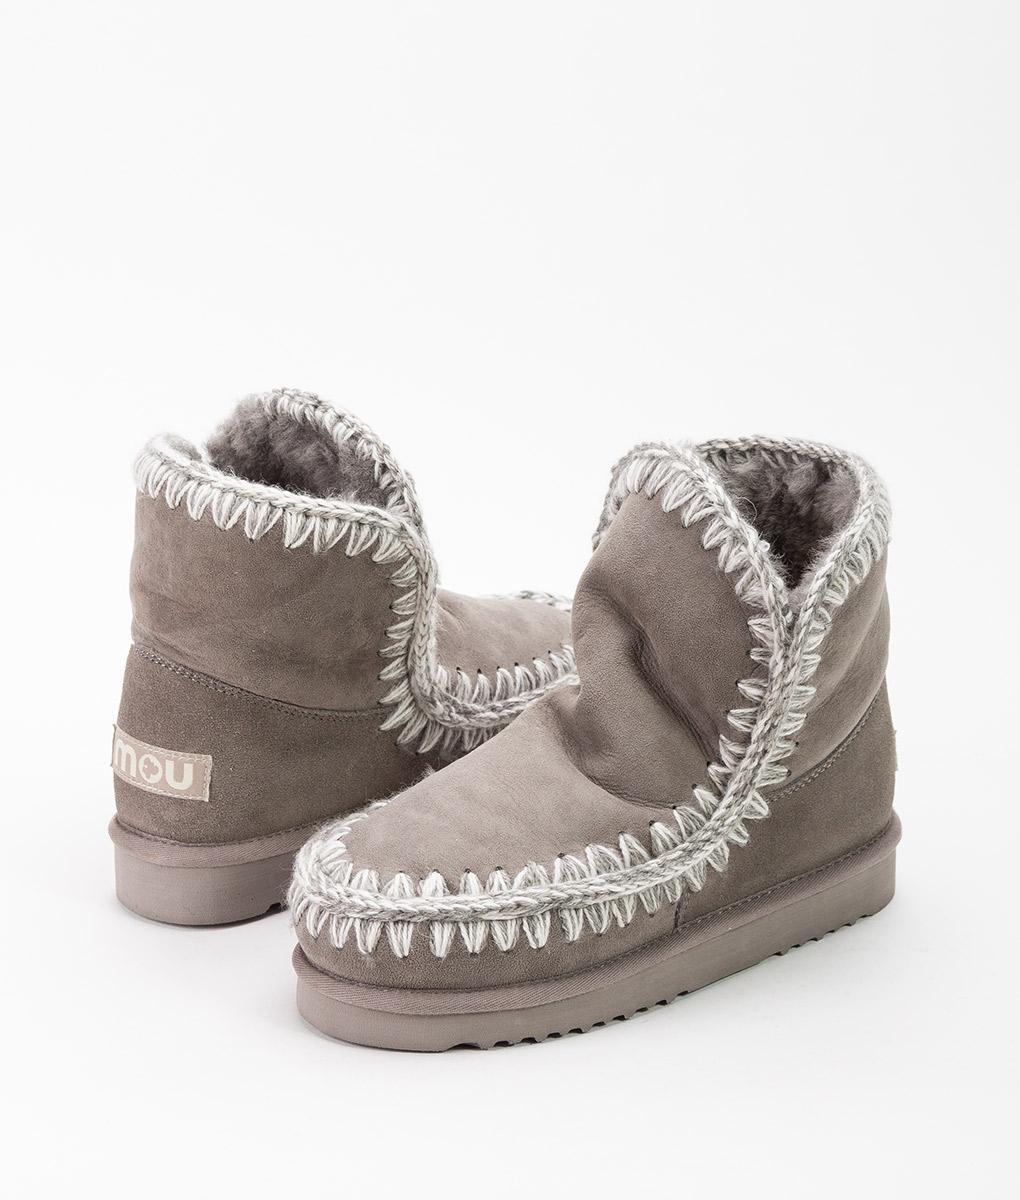 MOU Women Ankle Boots ESKIMO 18, Grey 199.99 1